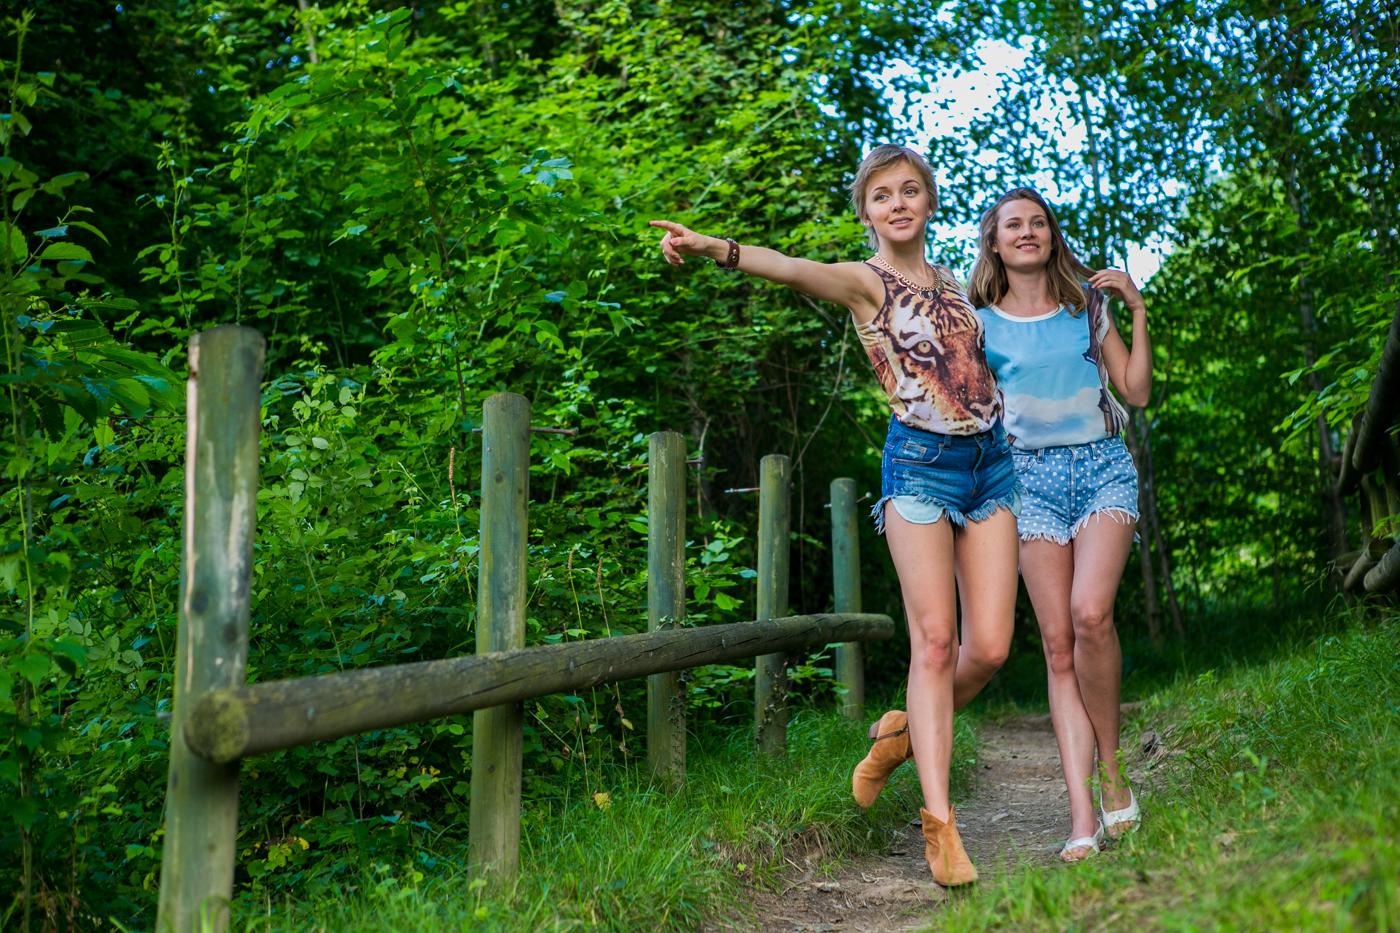 thecablook darya kamalova fashion blog street style denim shorts ash booties hm hat iseo lake piramidi di zona brescia-148